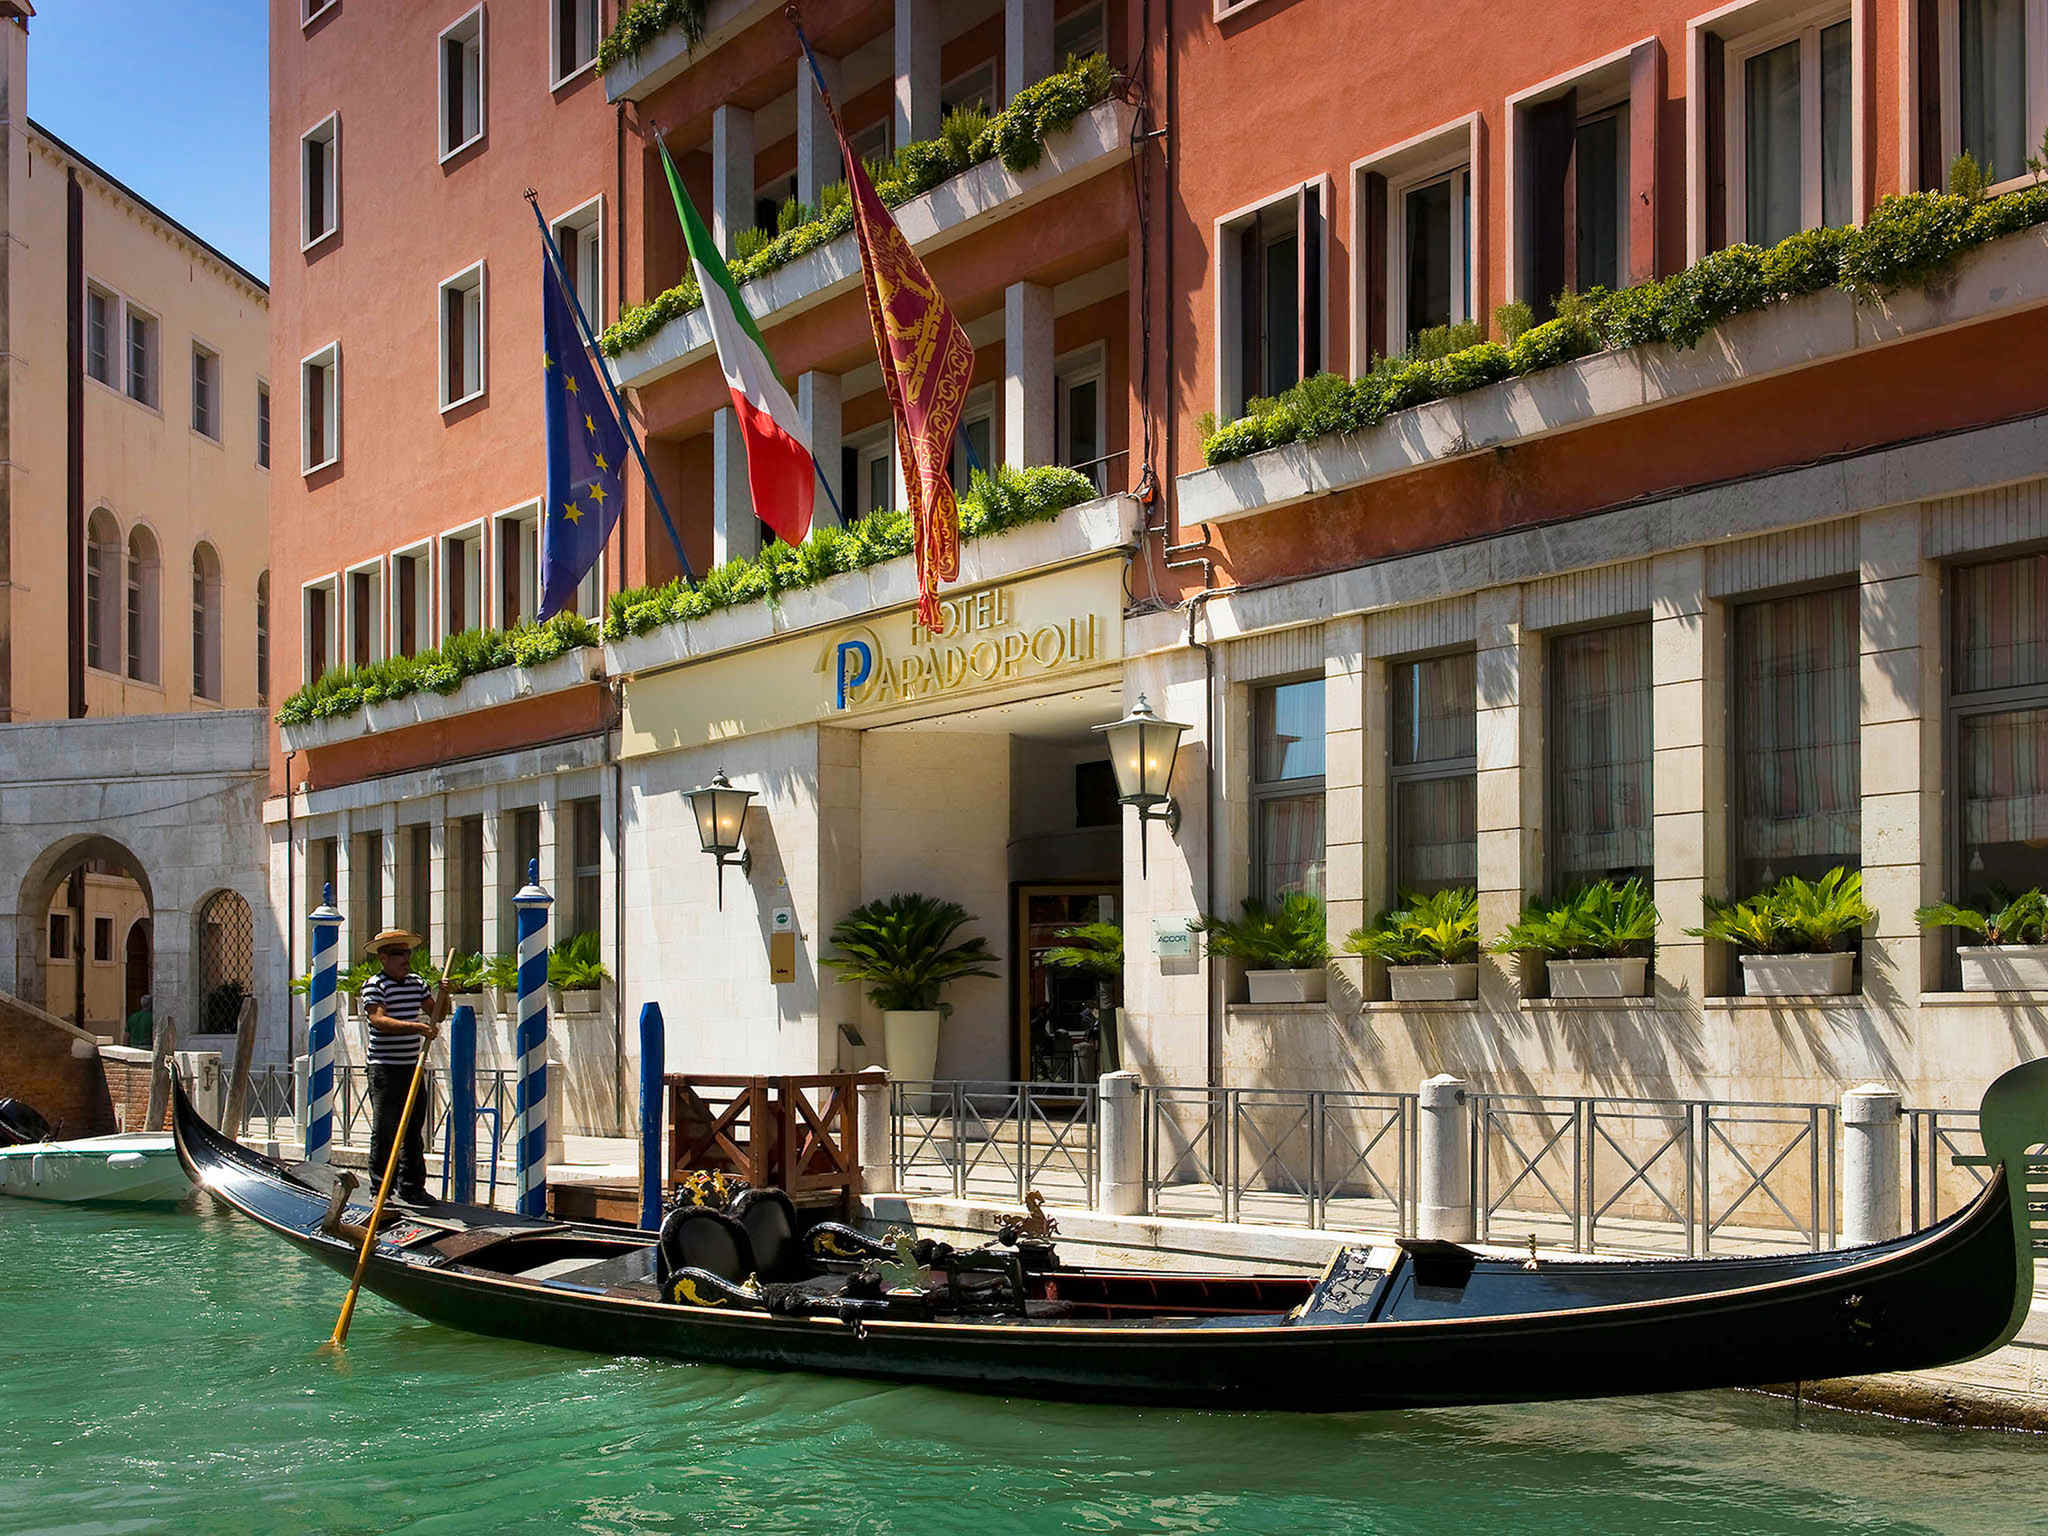 Hotel - Hotel Papadopoli Venezia - MGallery by Sofitel